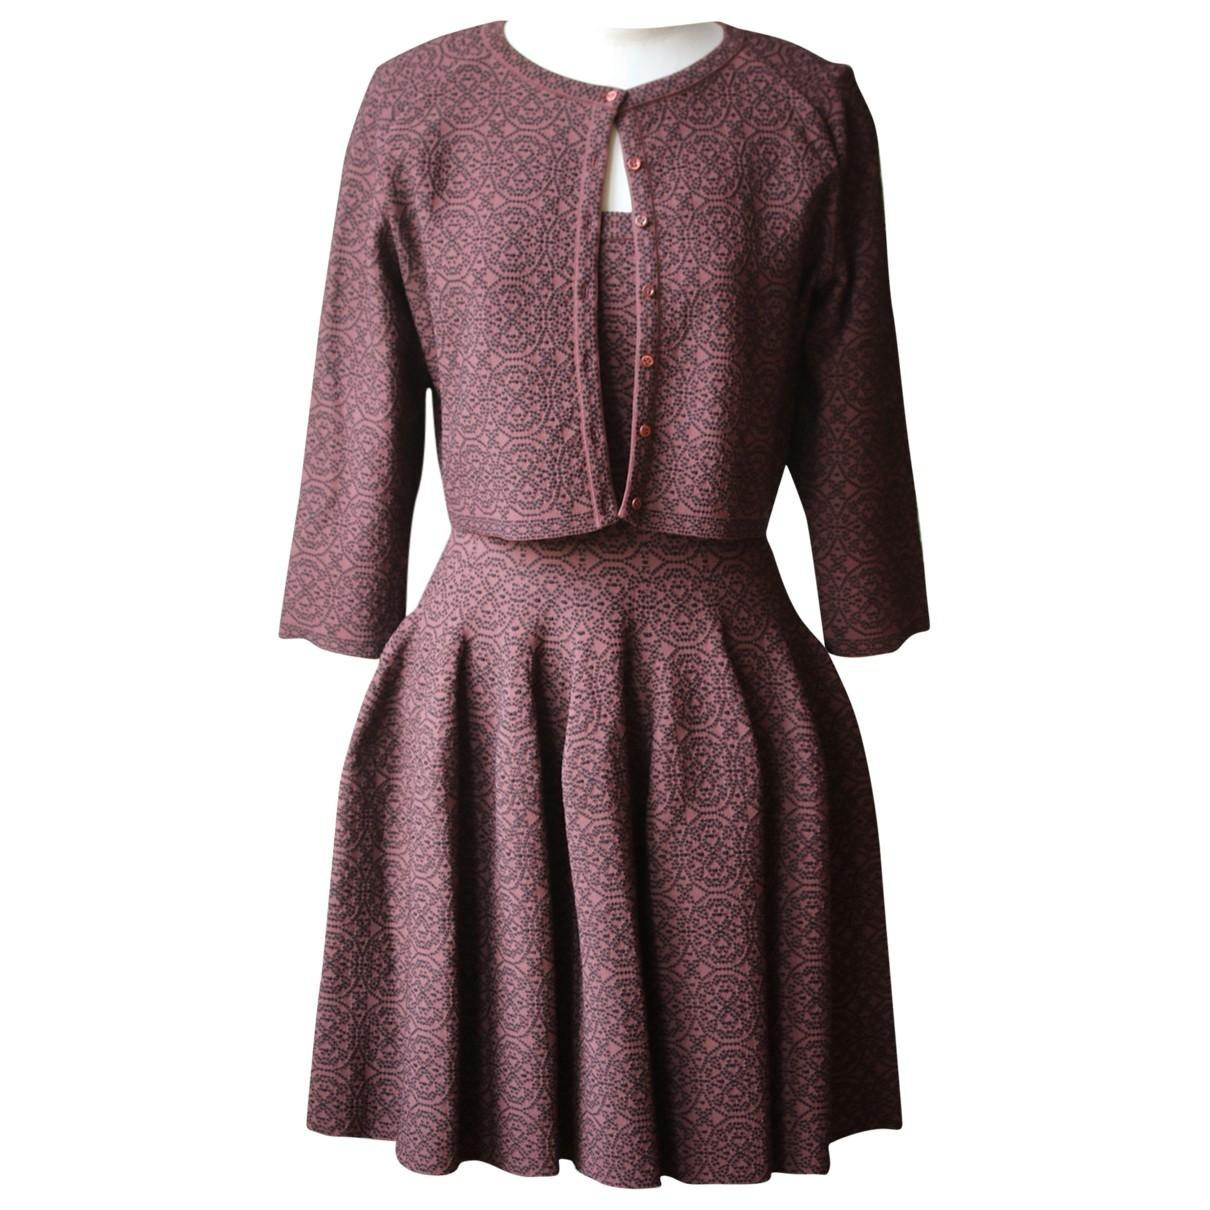 Alaïa \N Brown dress for Women 40 FR